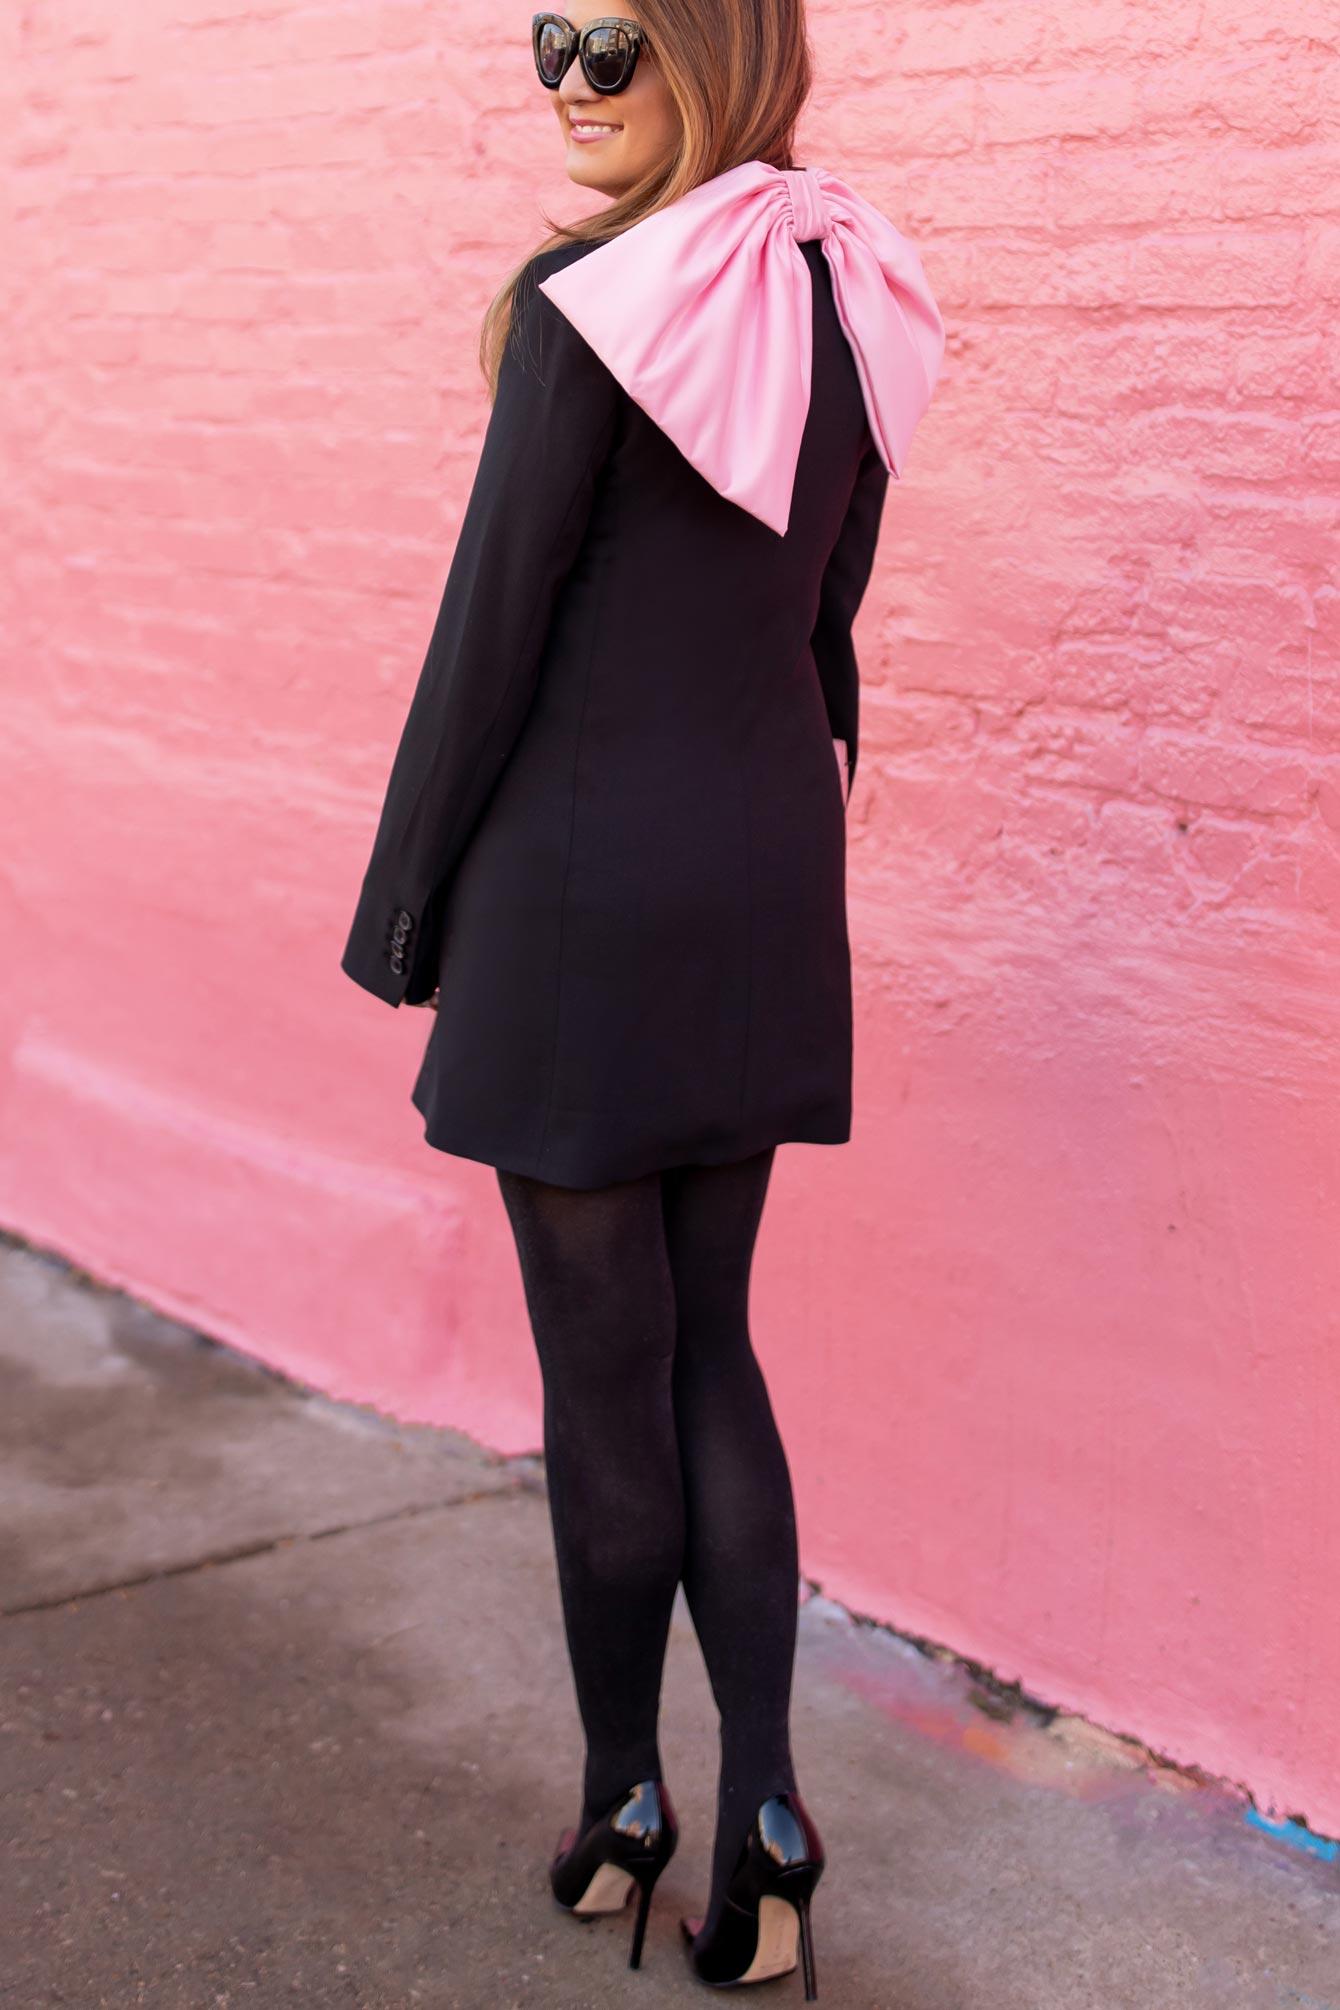 Zara Pink Bow Tuxedo Dress